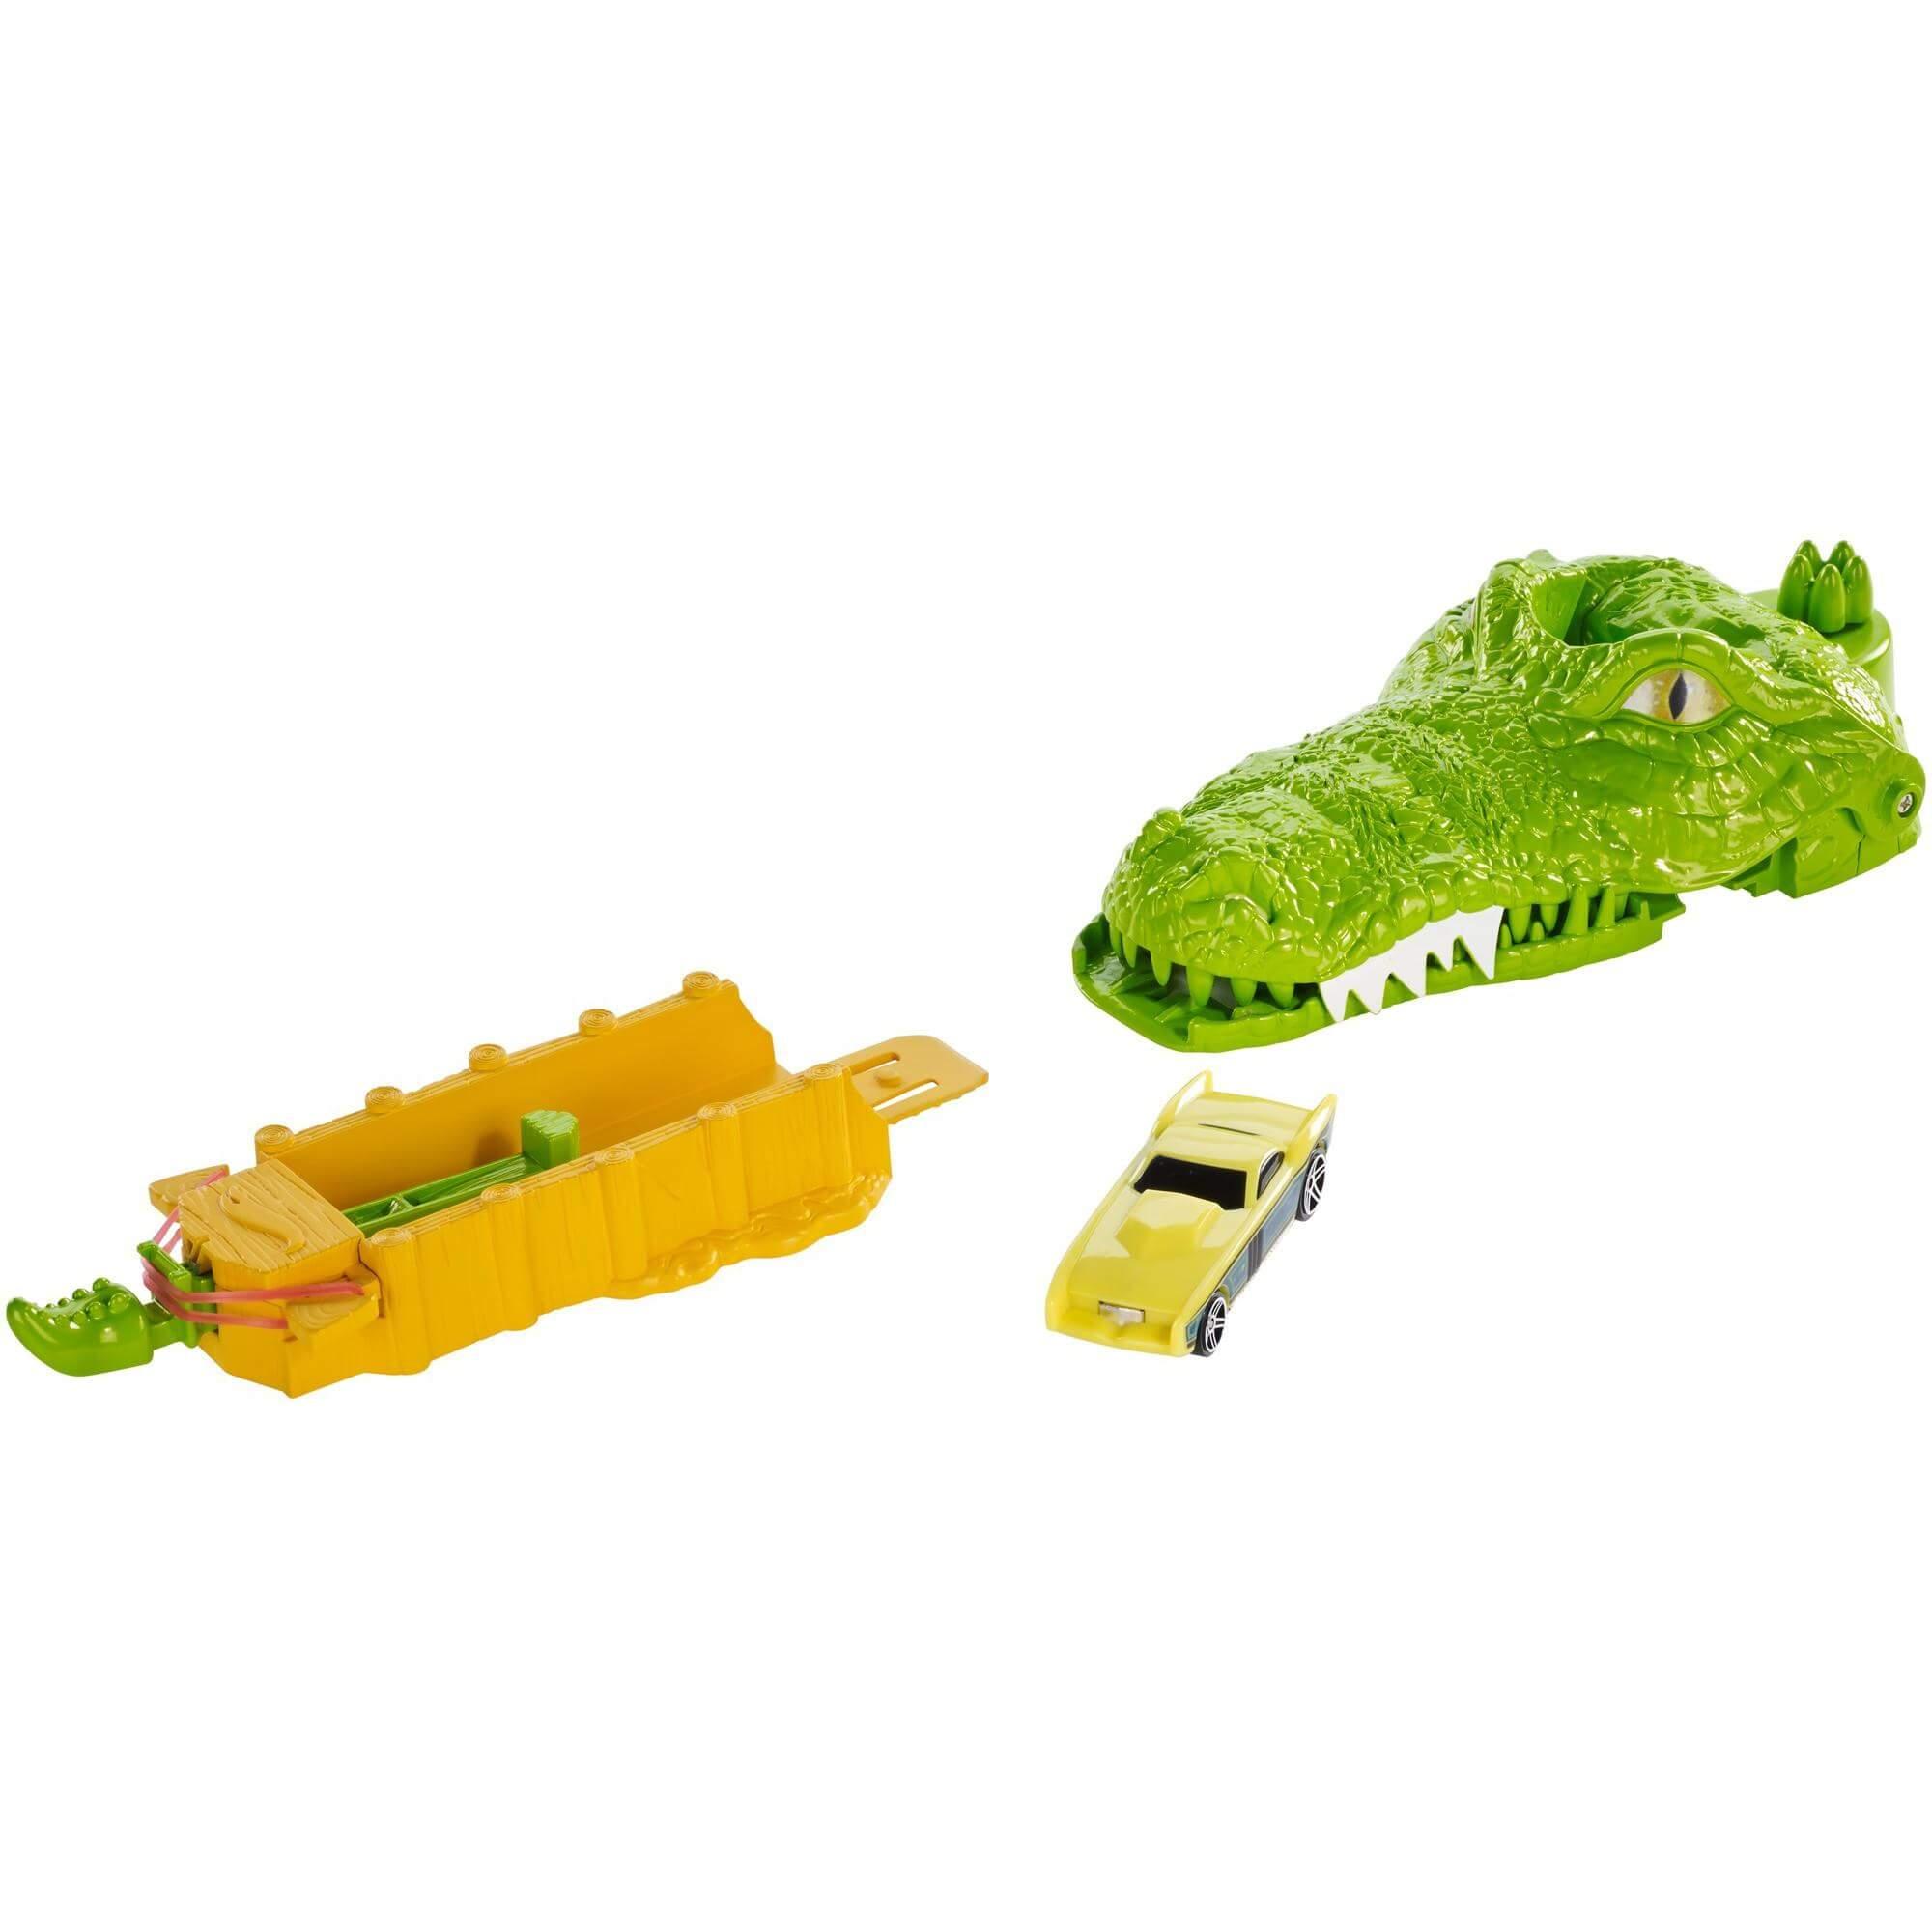 крокодил хот вилс